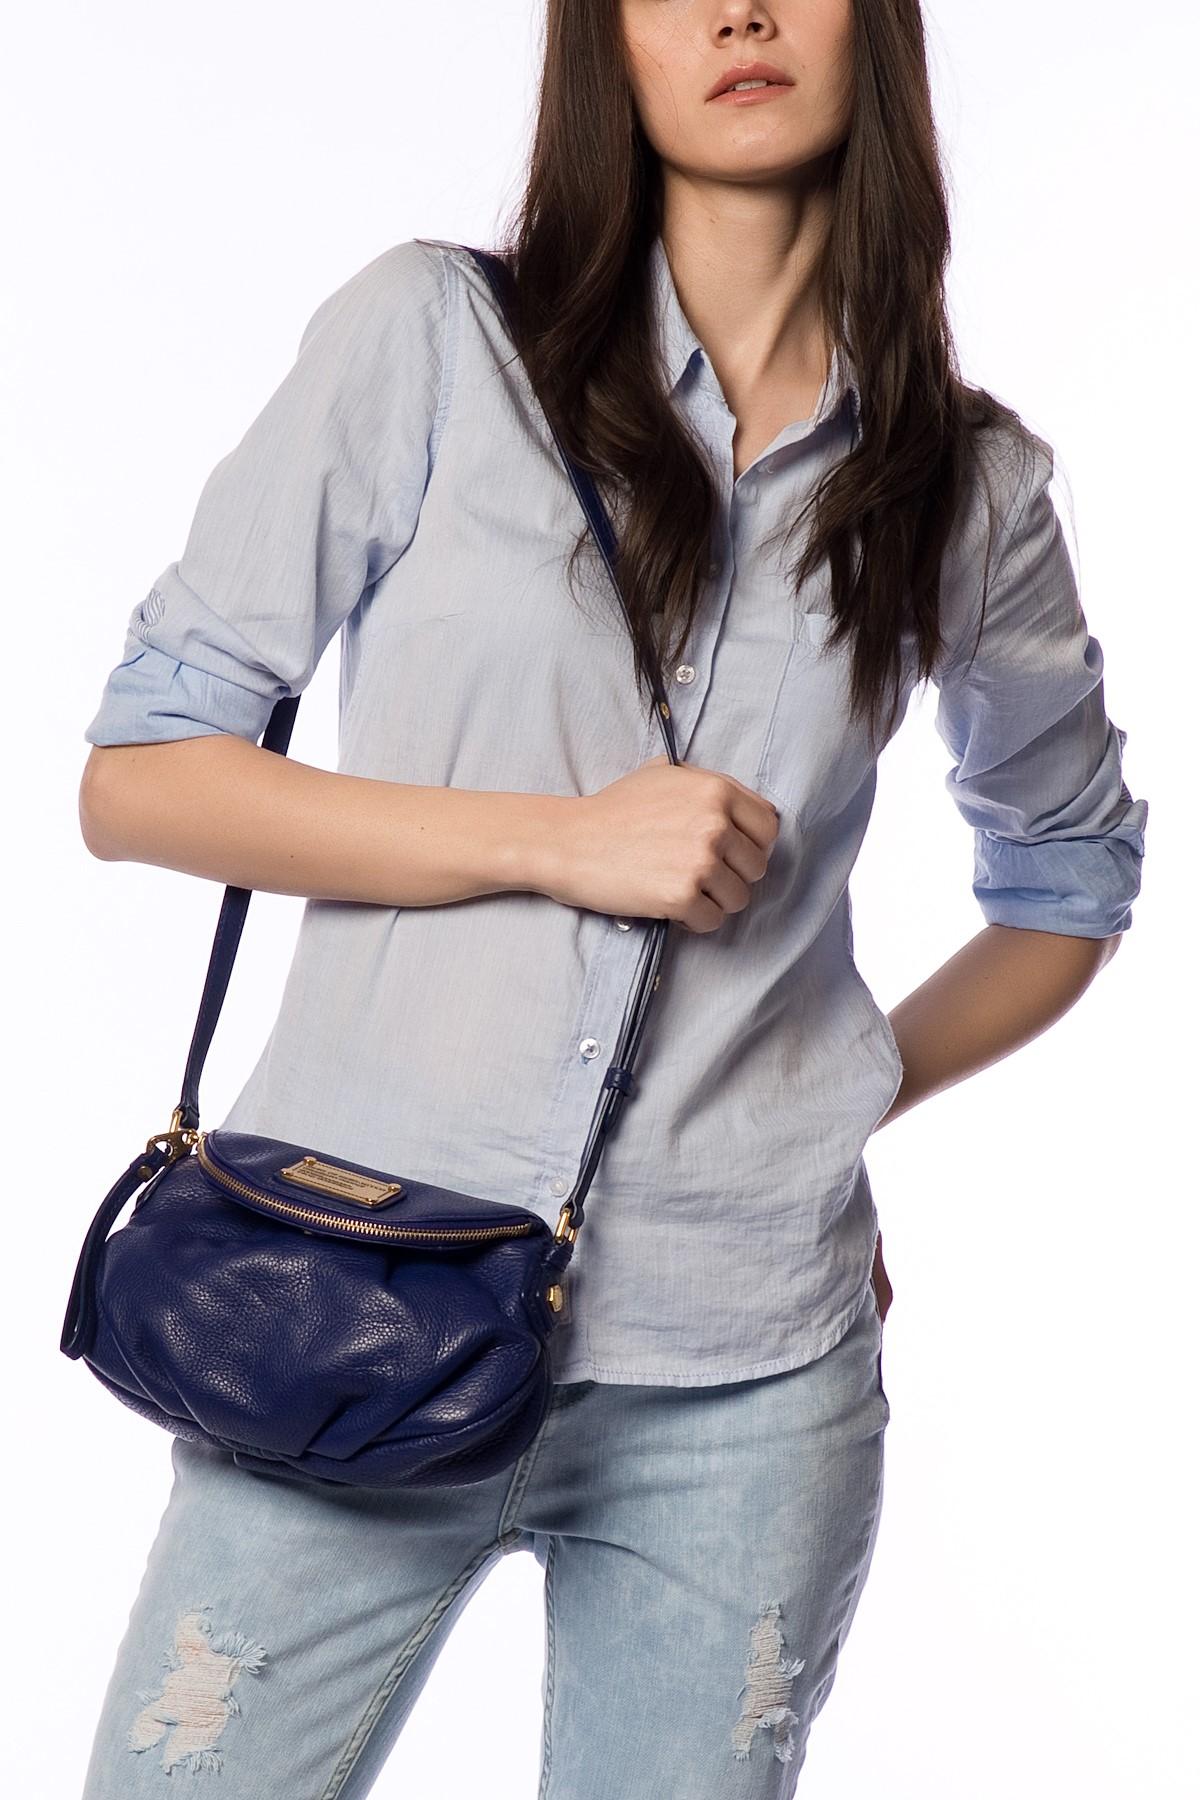 Koyu Mavi Marc Jacobs 2015 Çanta Modelleri